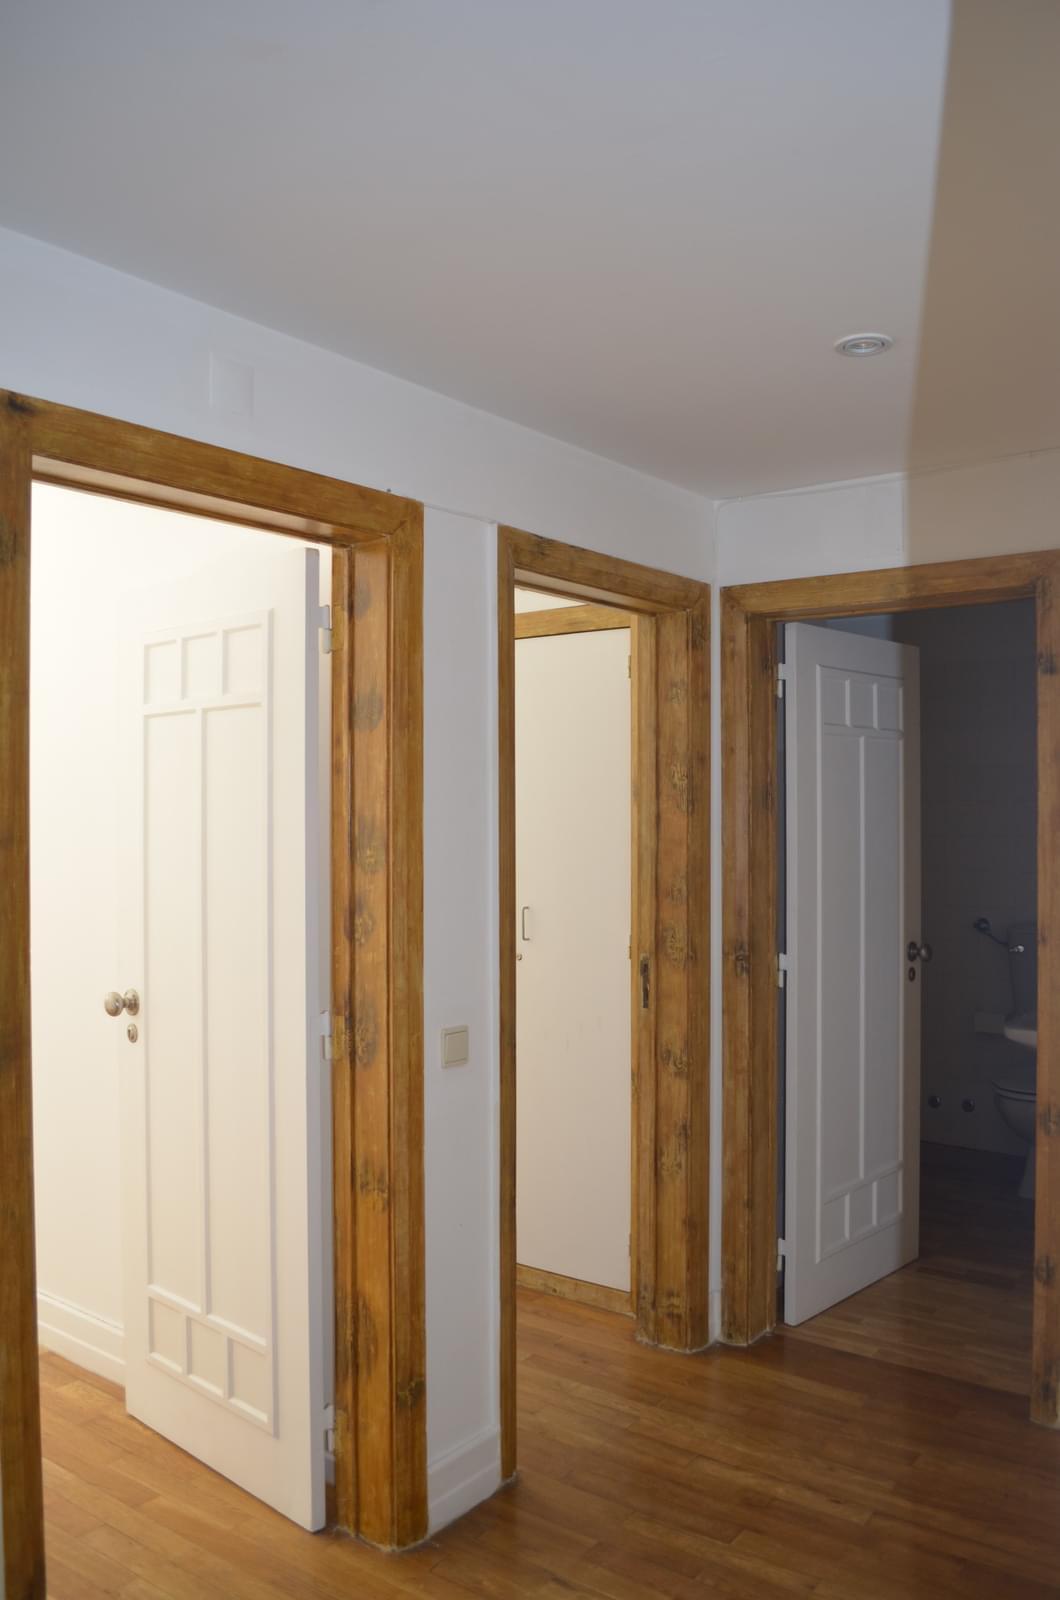 pf17565-apartamento-t3-lisboa-61fa1bb3-f11c-4608-a19b-7900bc11e090